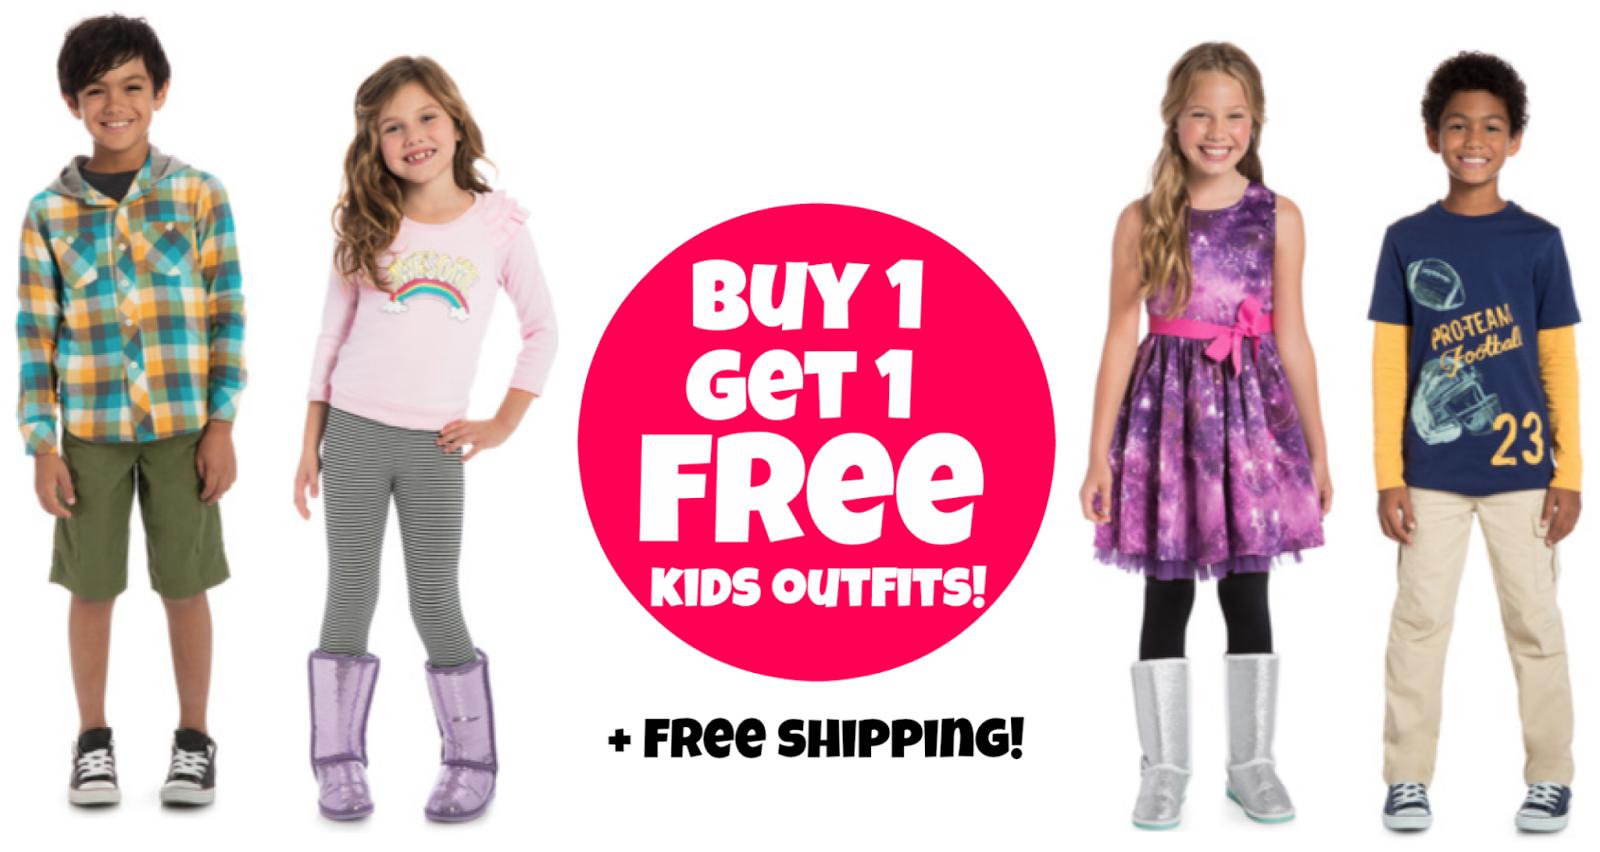 http://www.thebinderladies.com/2015/02/fabkids-buy-1-get-1-free-kids-outfits.html